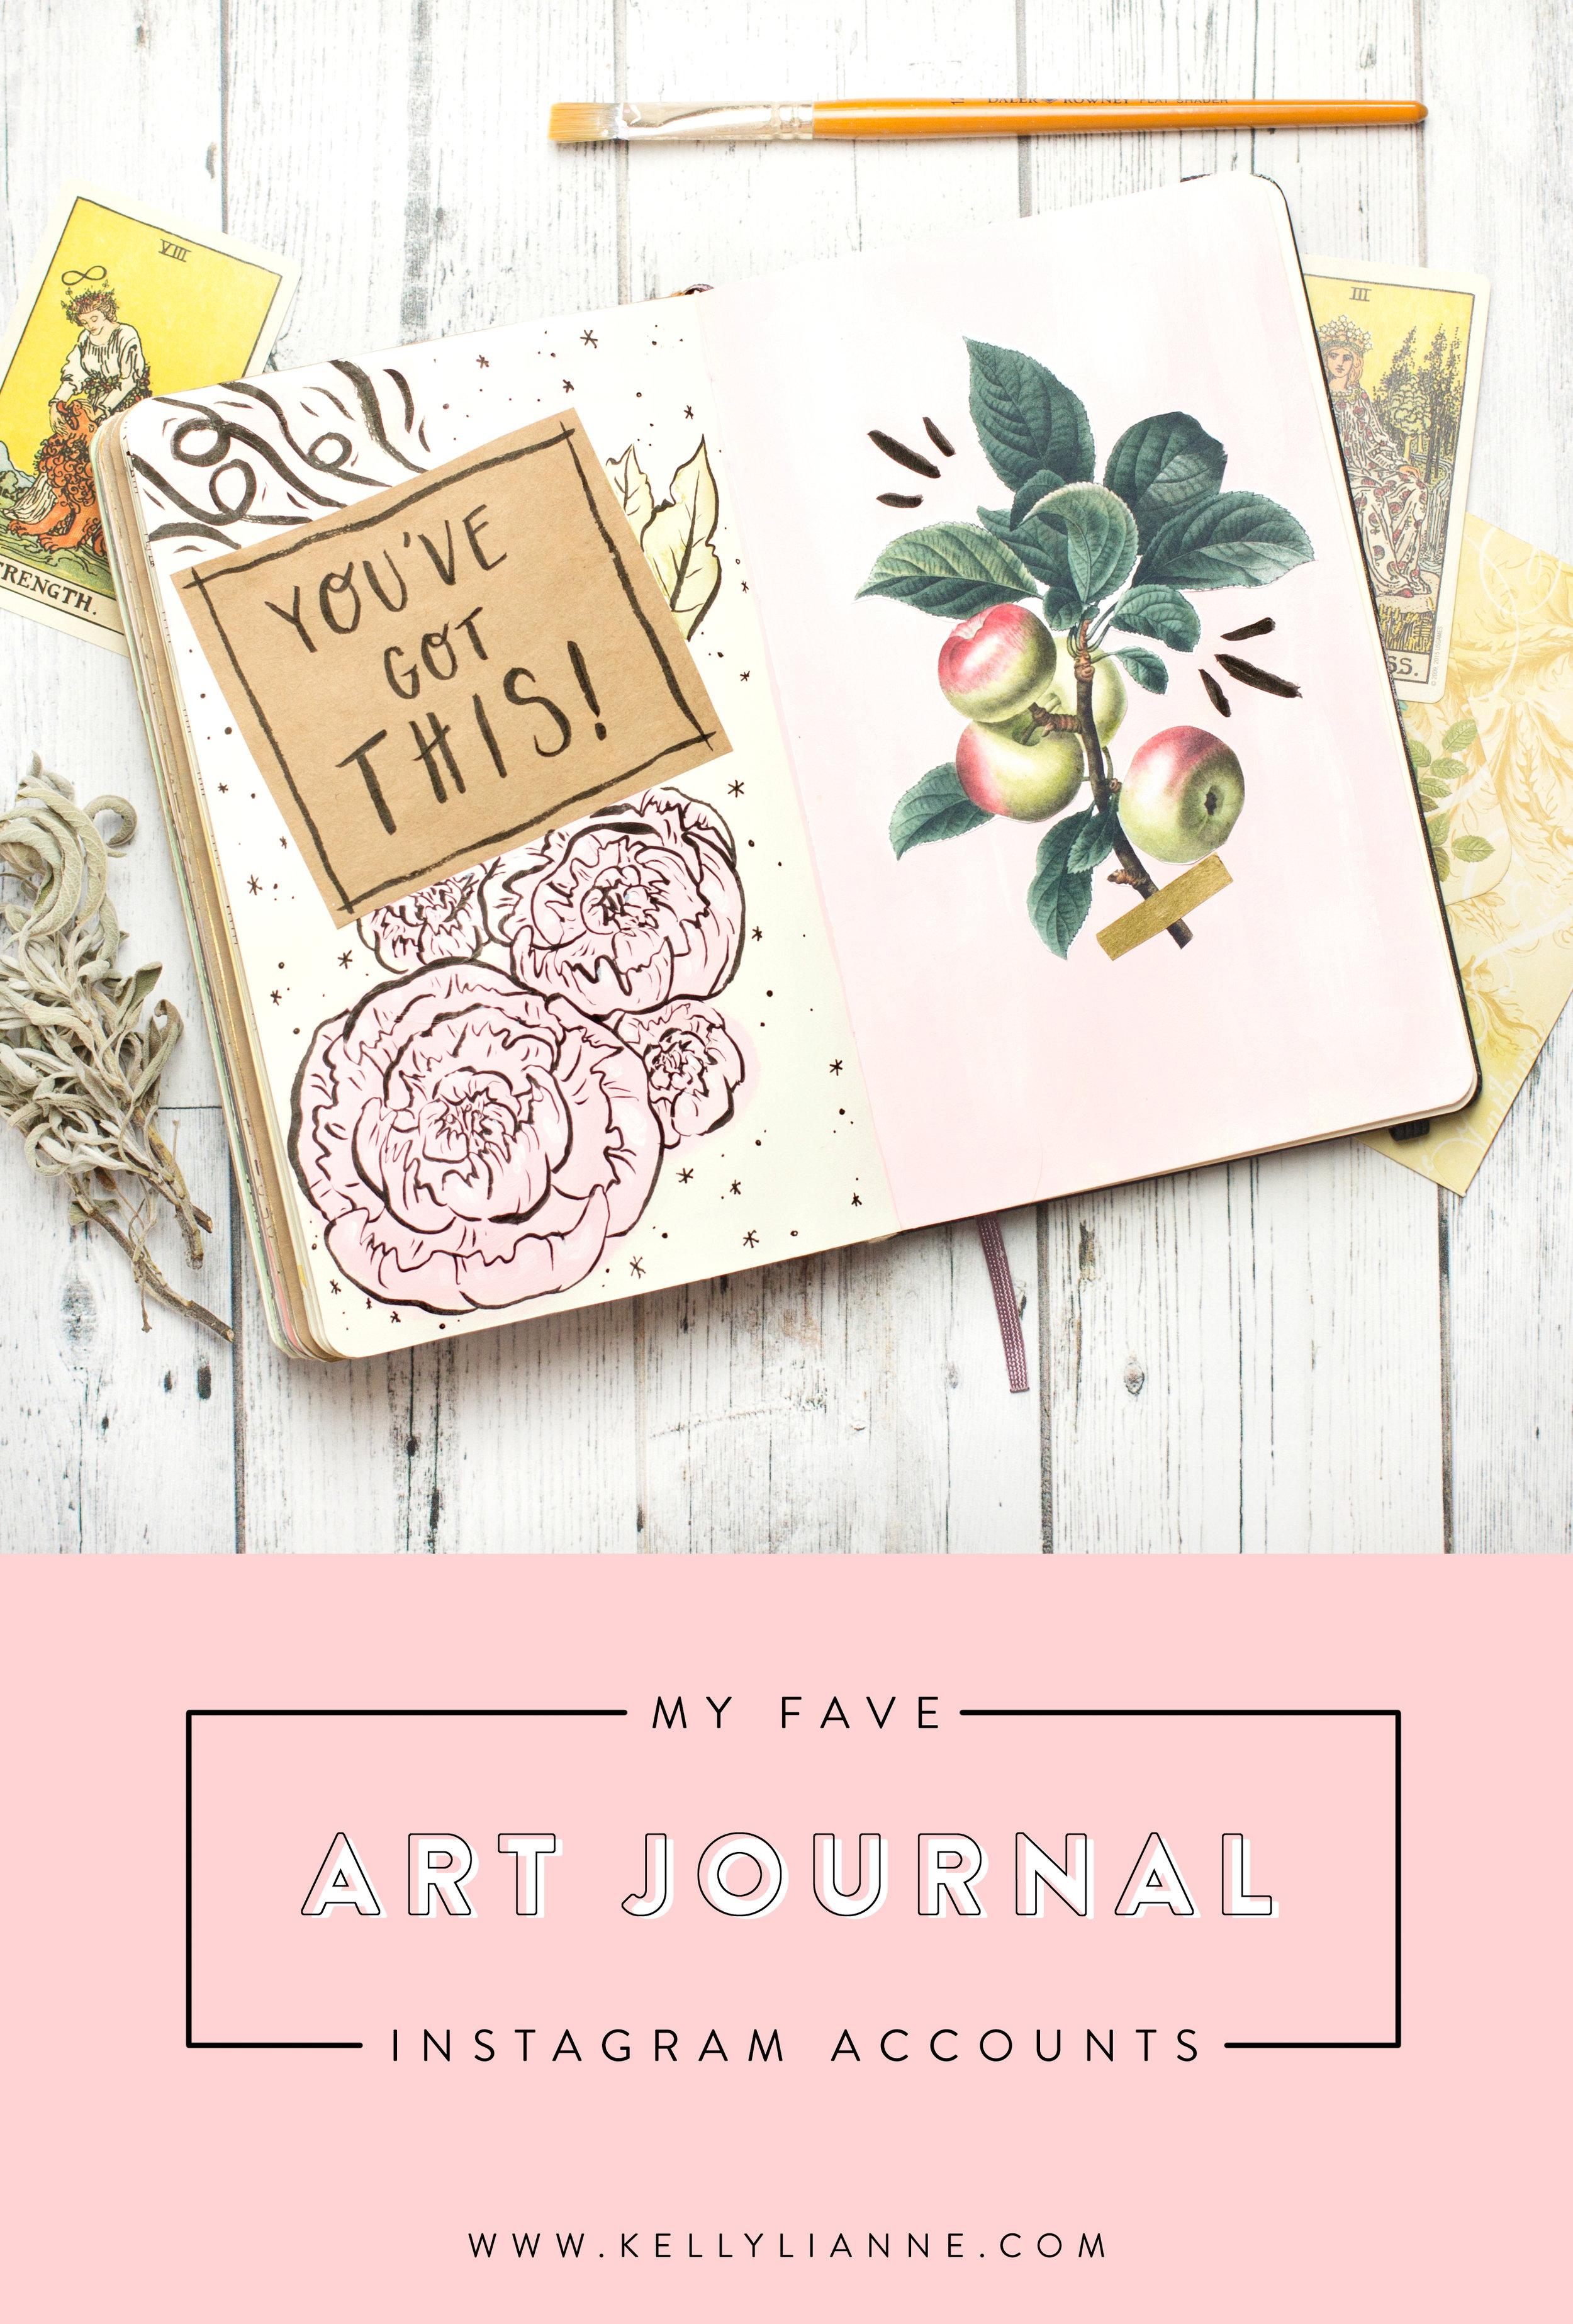 my fave art journal instagram accounts pinterest graphic.jpg